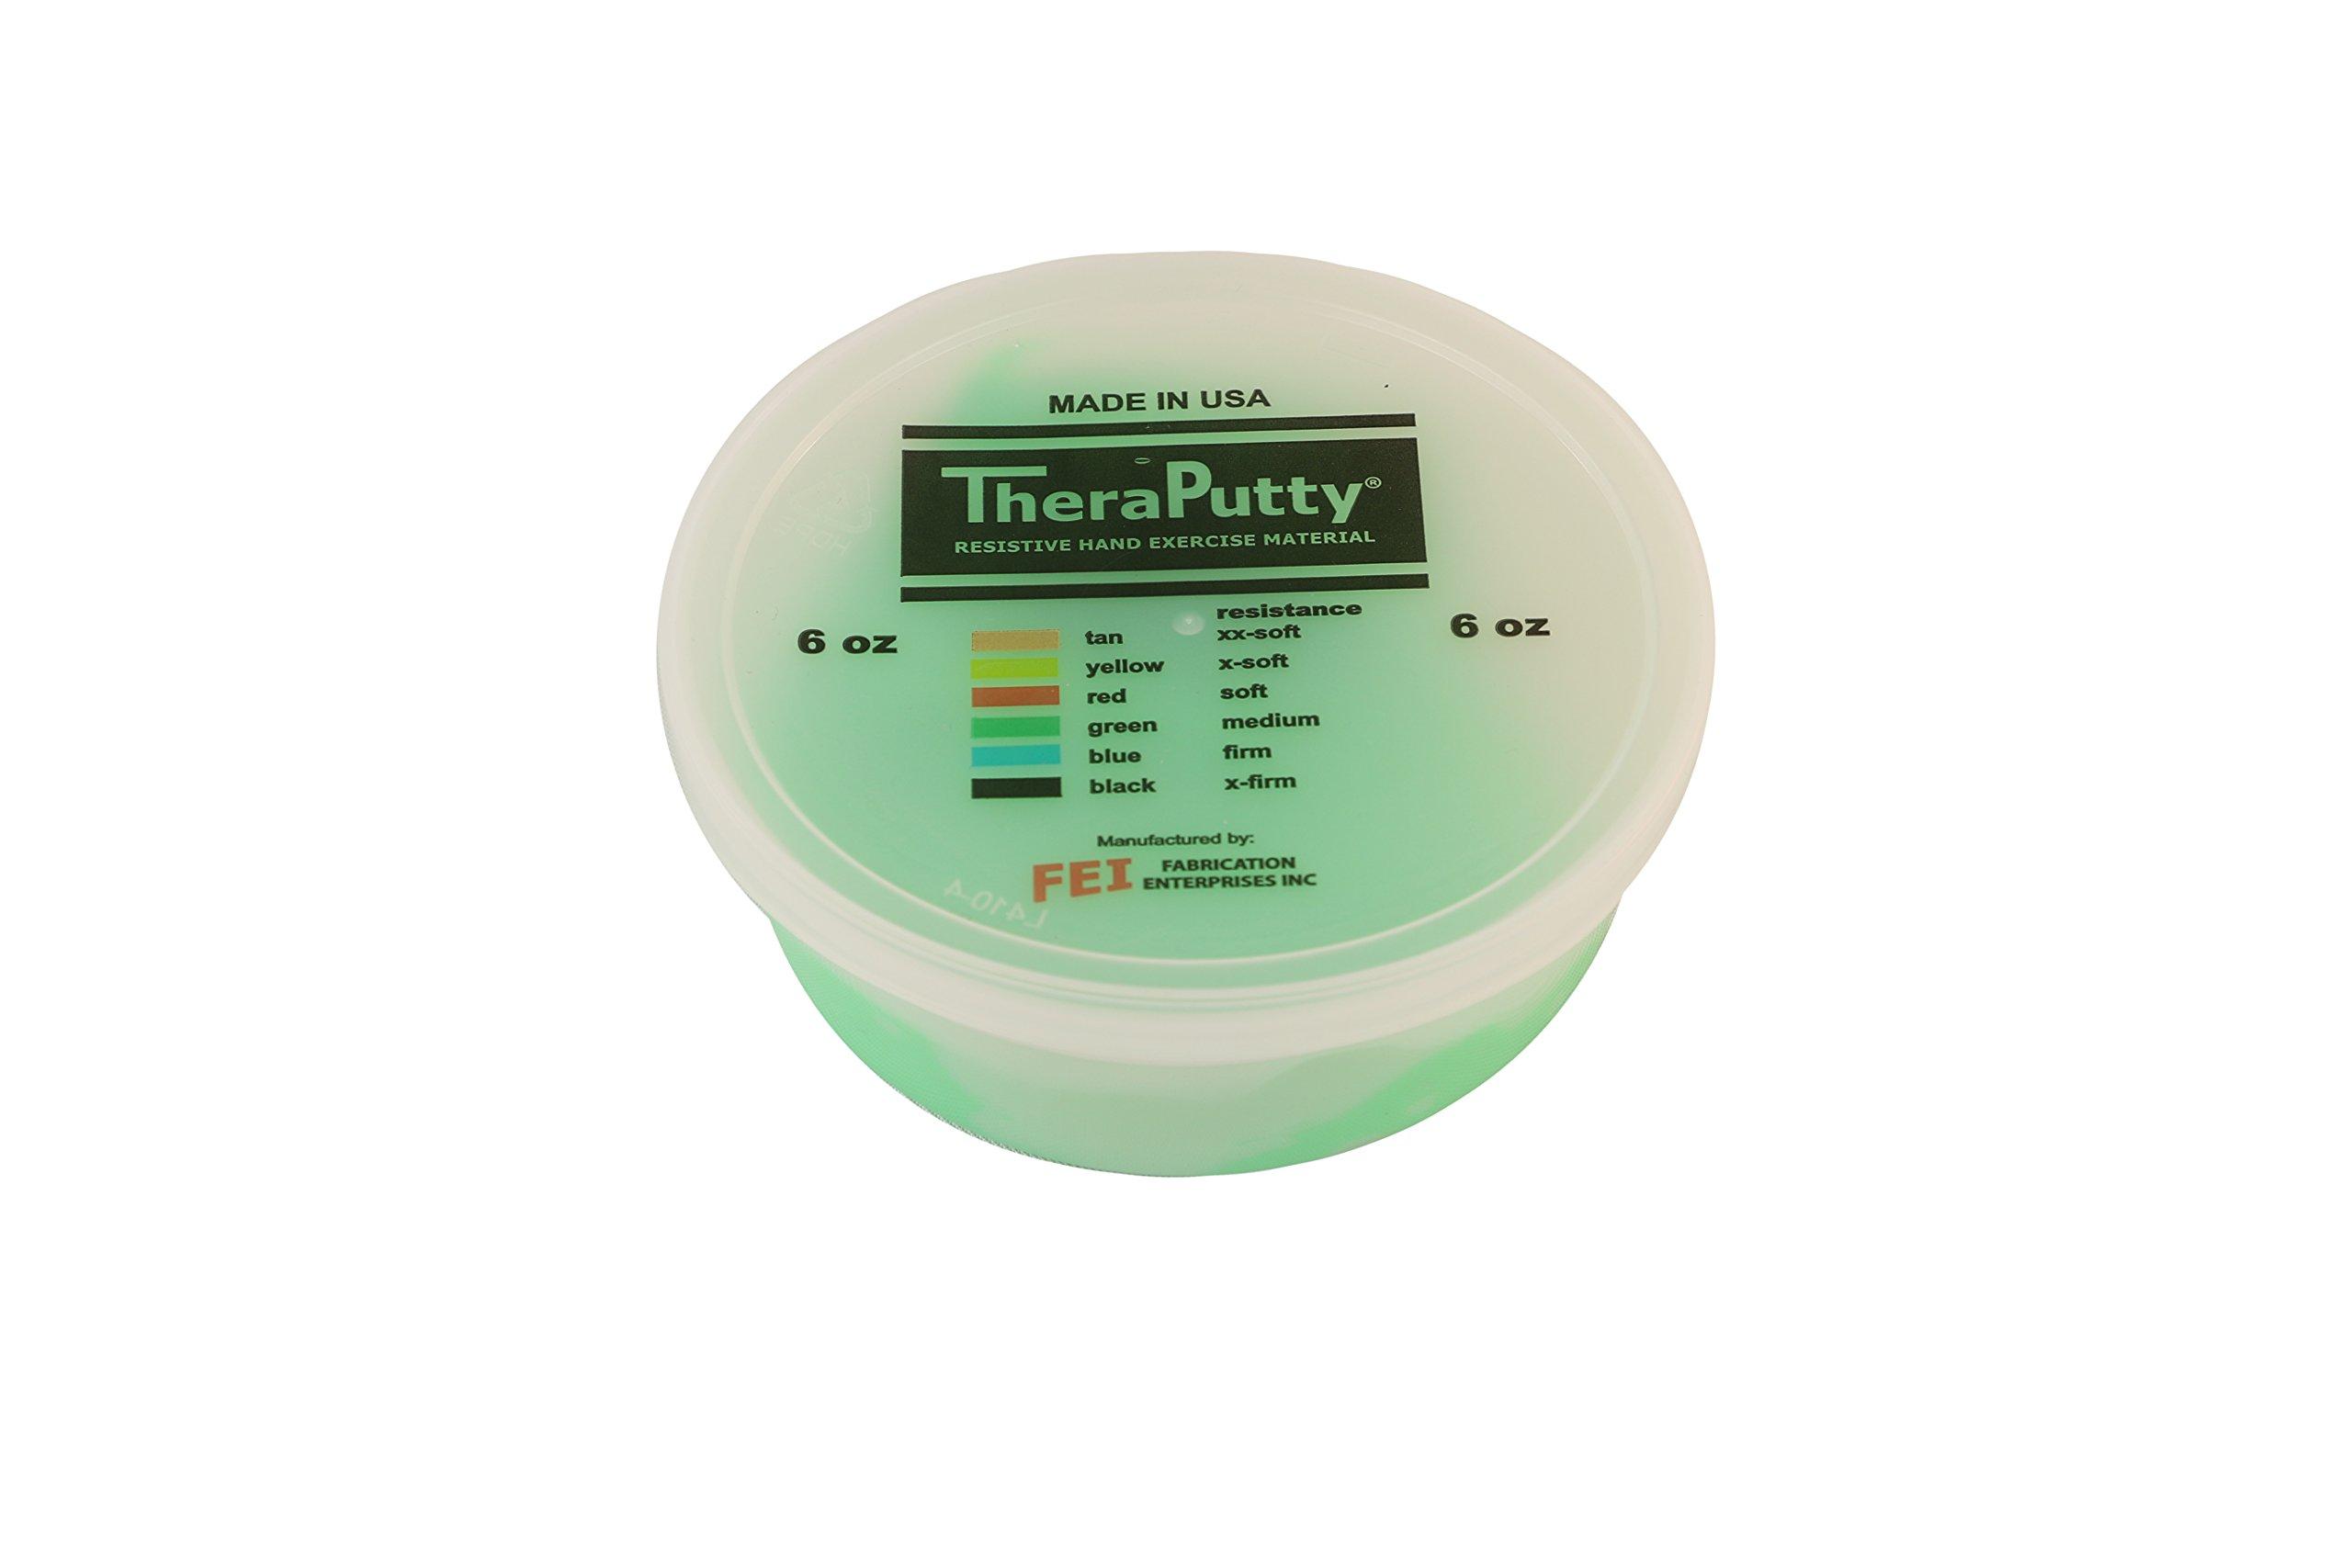 CanDo TheraPutty Plus Anti-microbial, Green: Medium, 6 oz